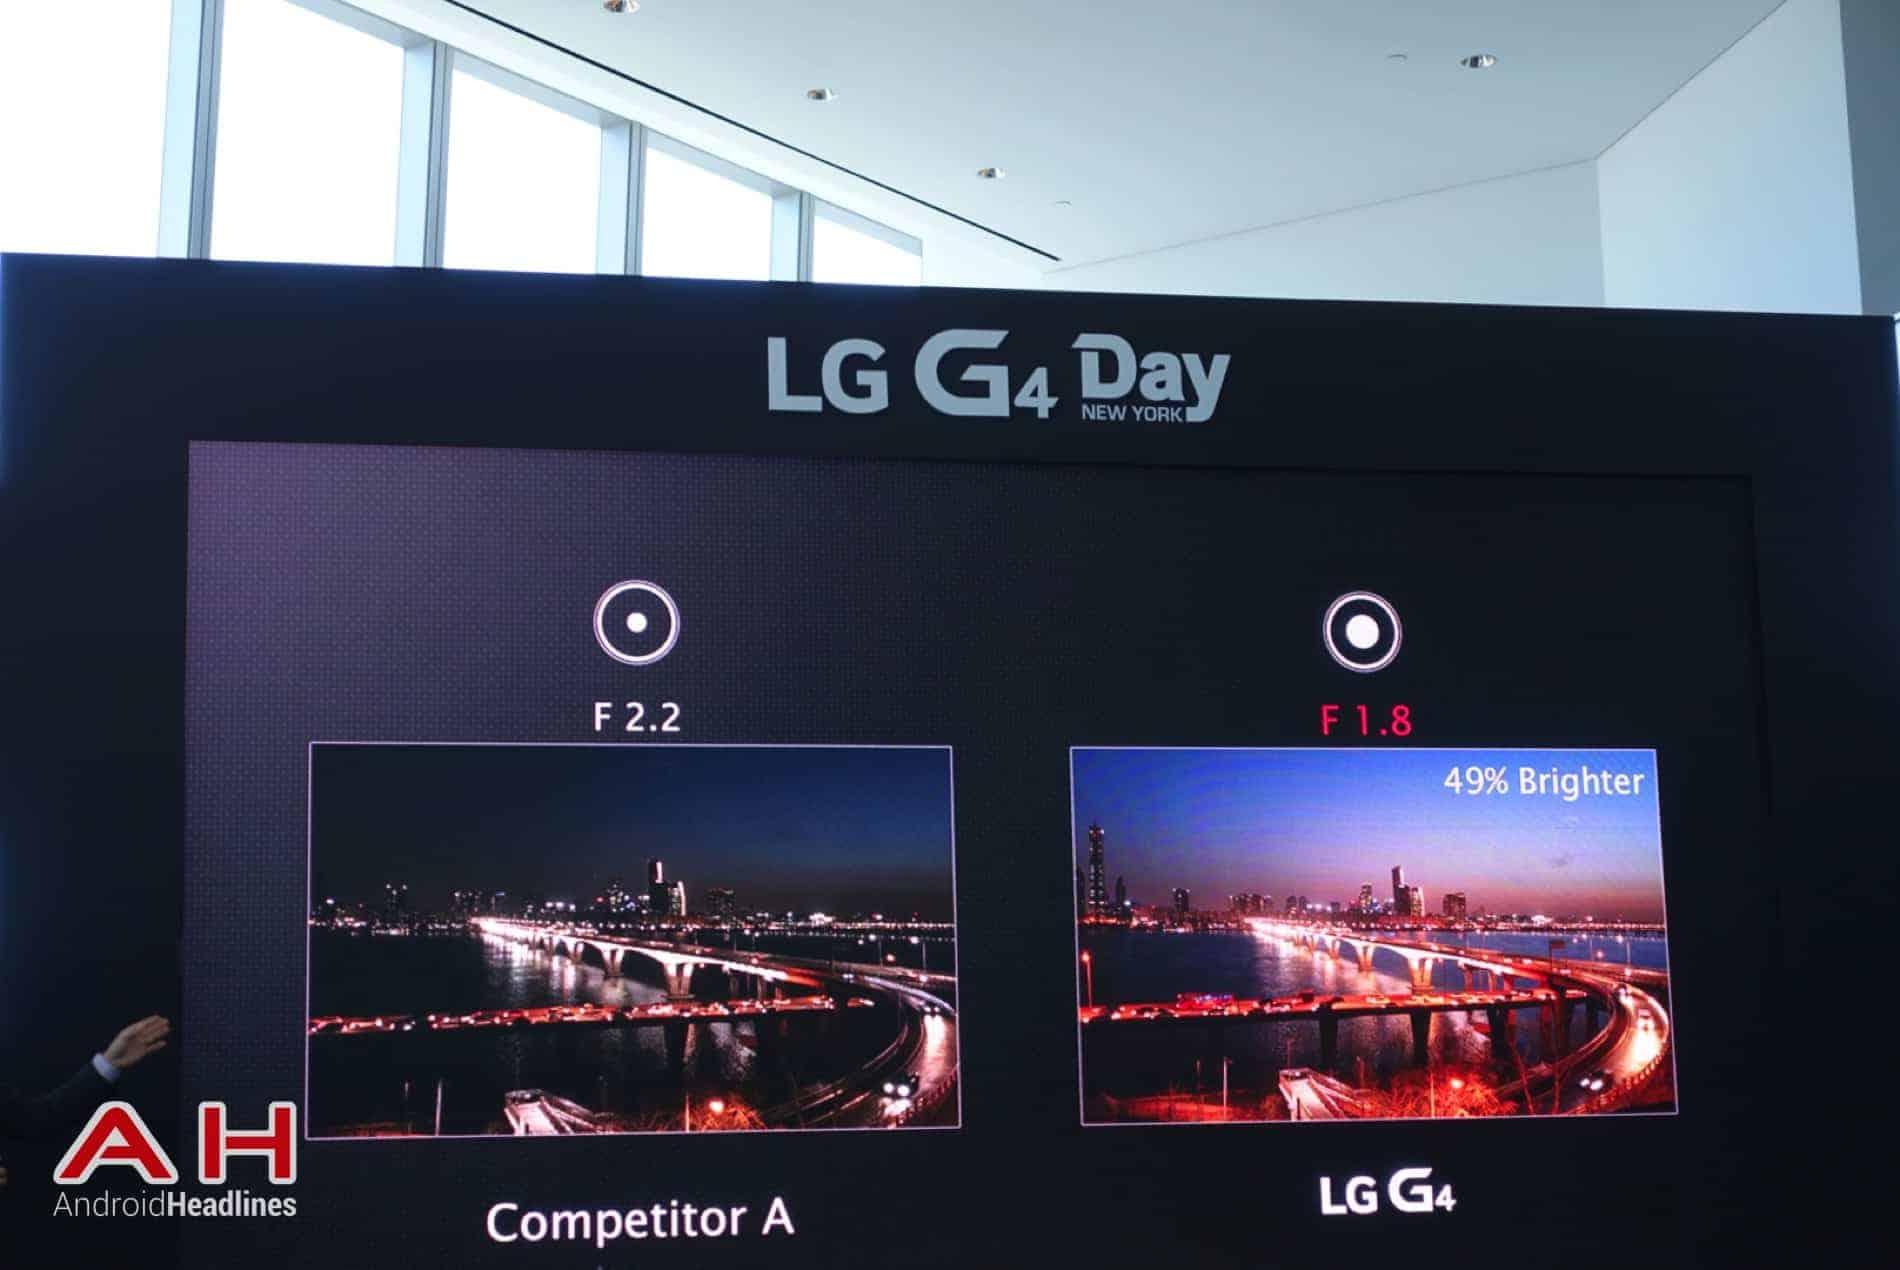 LG G4 Day AH 03 091